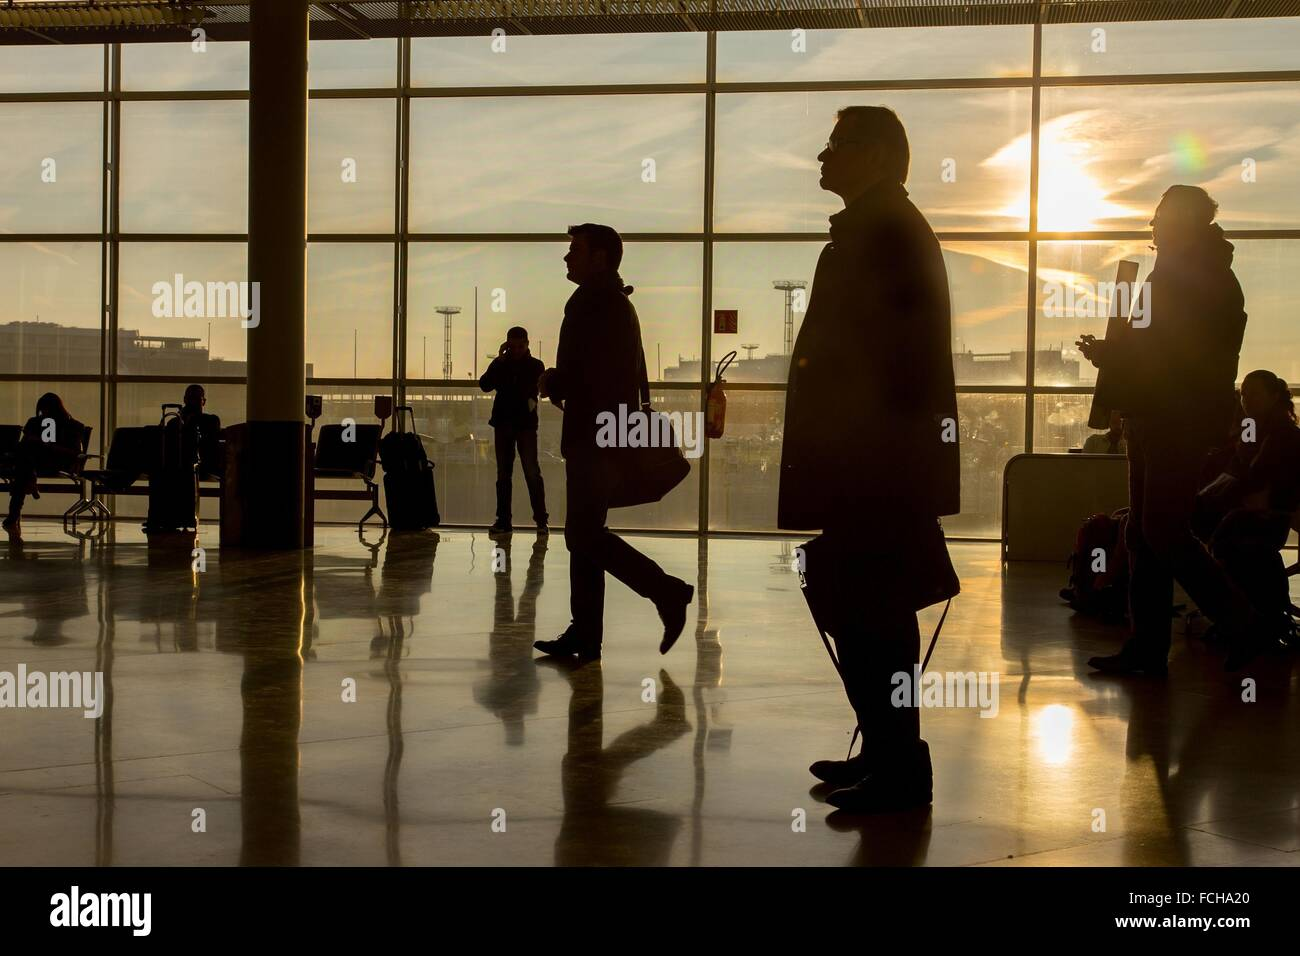 ILLUSTRATION AIRPORTS OF PARIS, ORLY, (94) VAL-DE-MARNE, ILE-DE-FRANCE - Stock Image